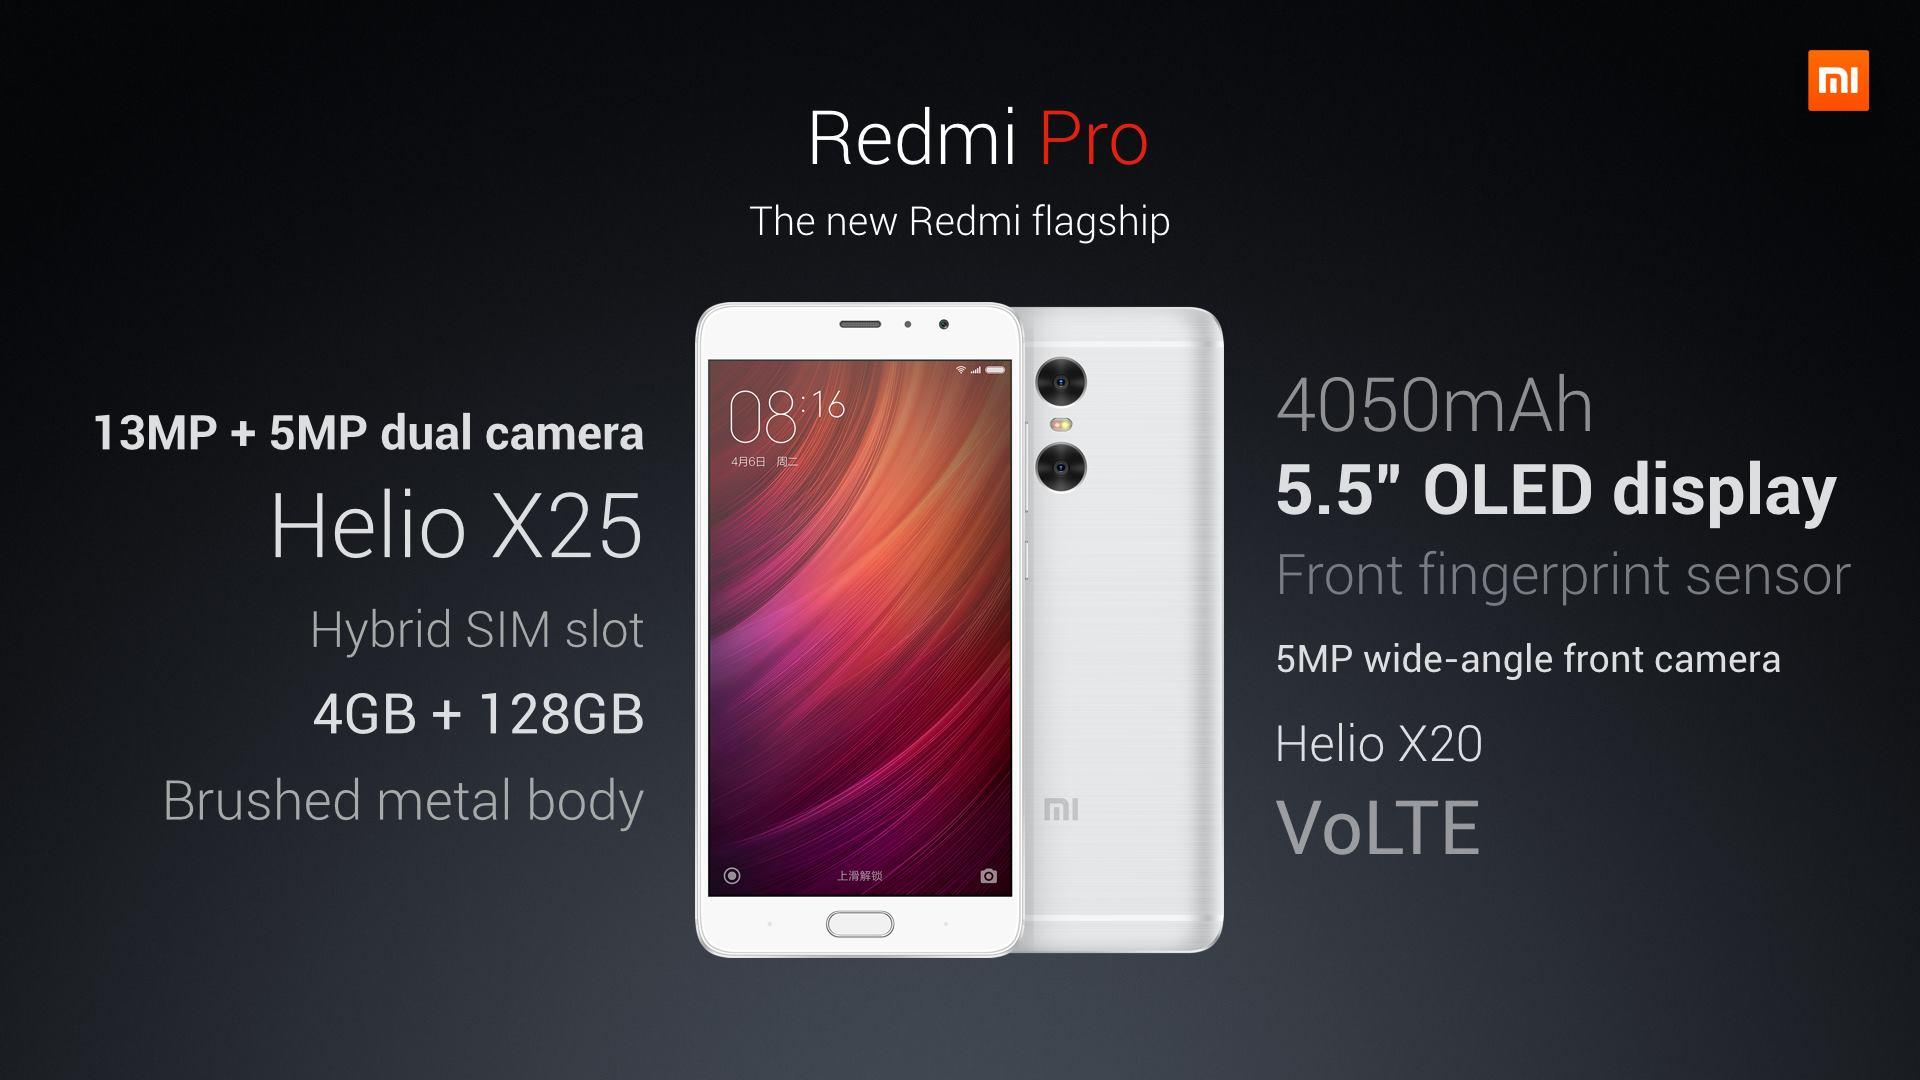 Xiaomi Redmi Pro 13692802_10153553049321612_2821487809717101738_o